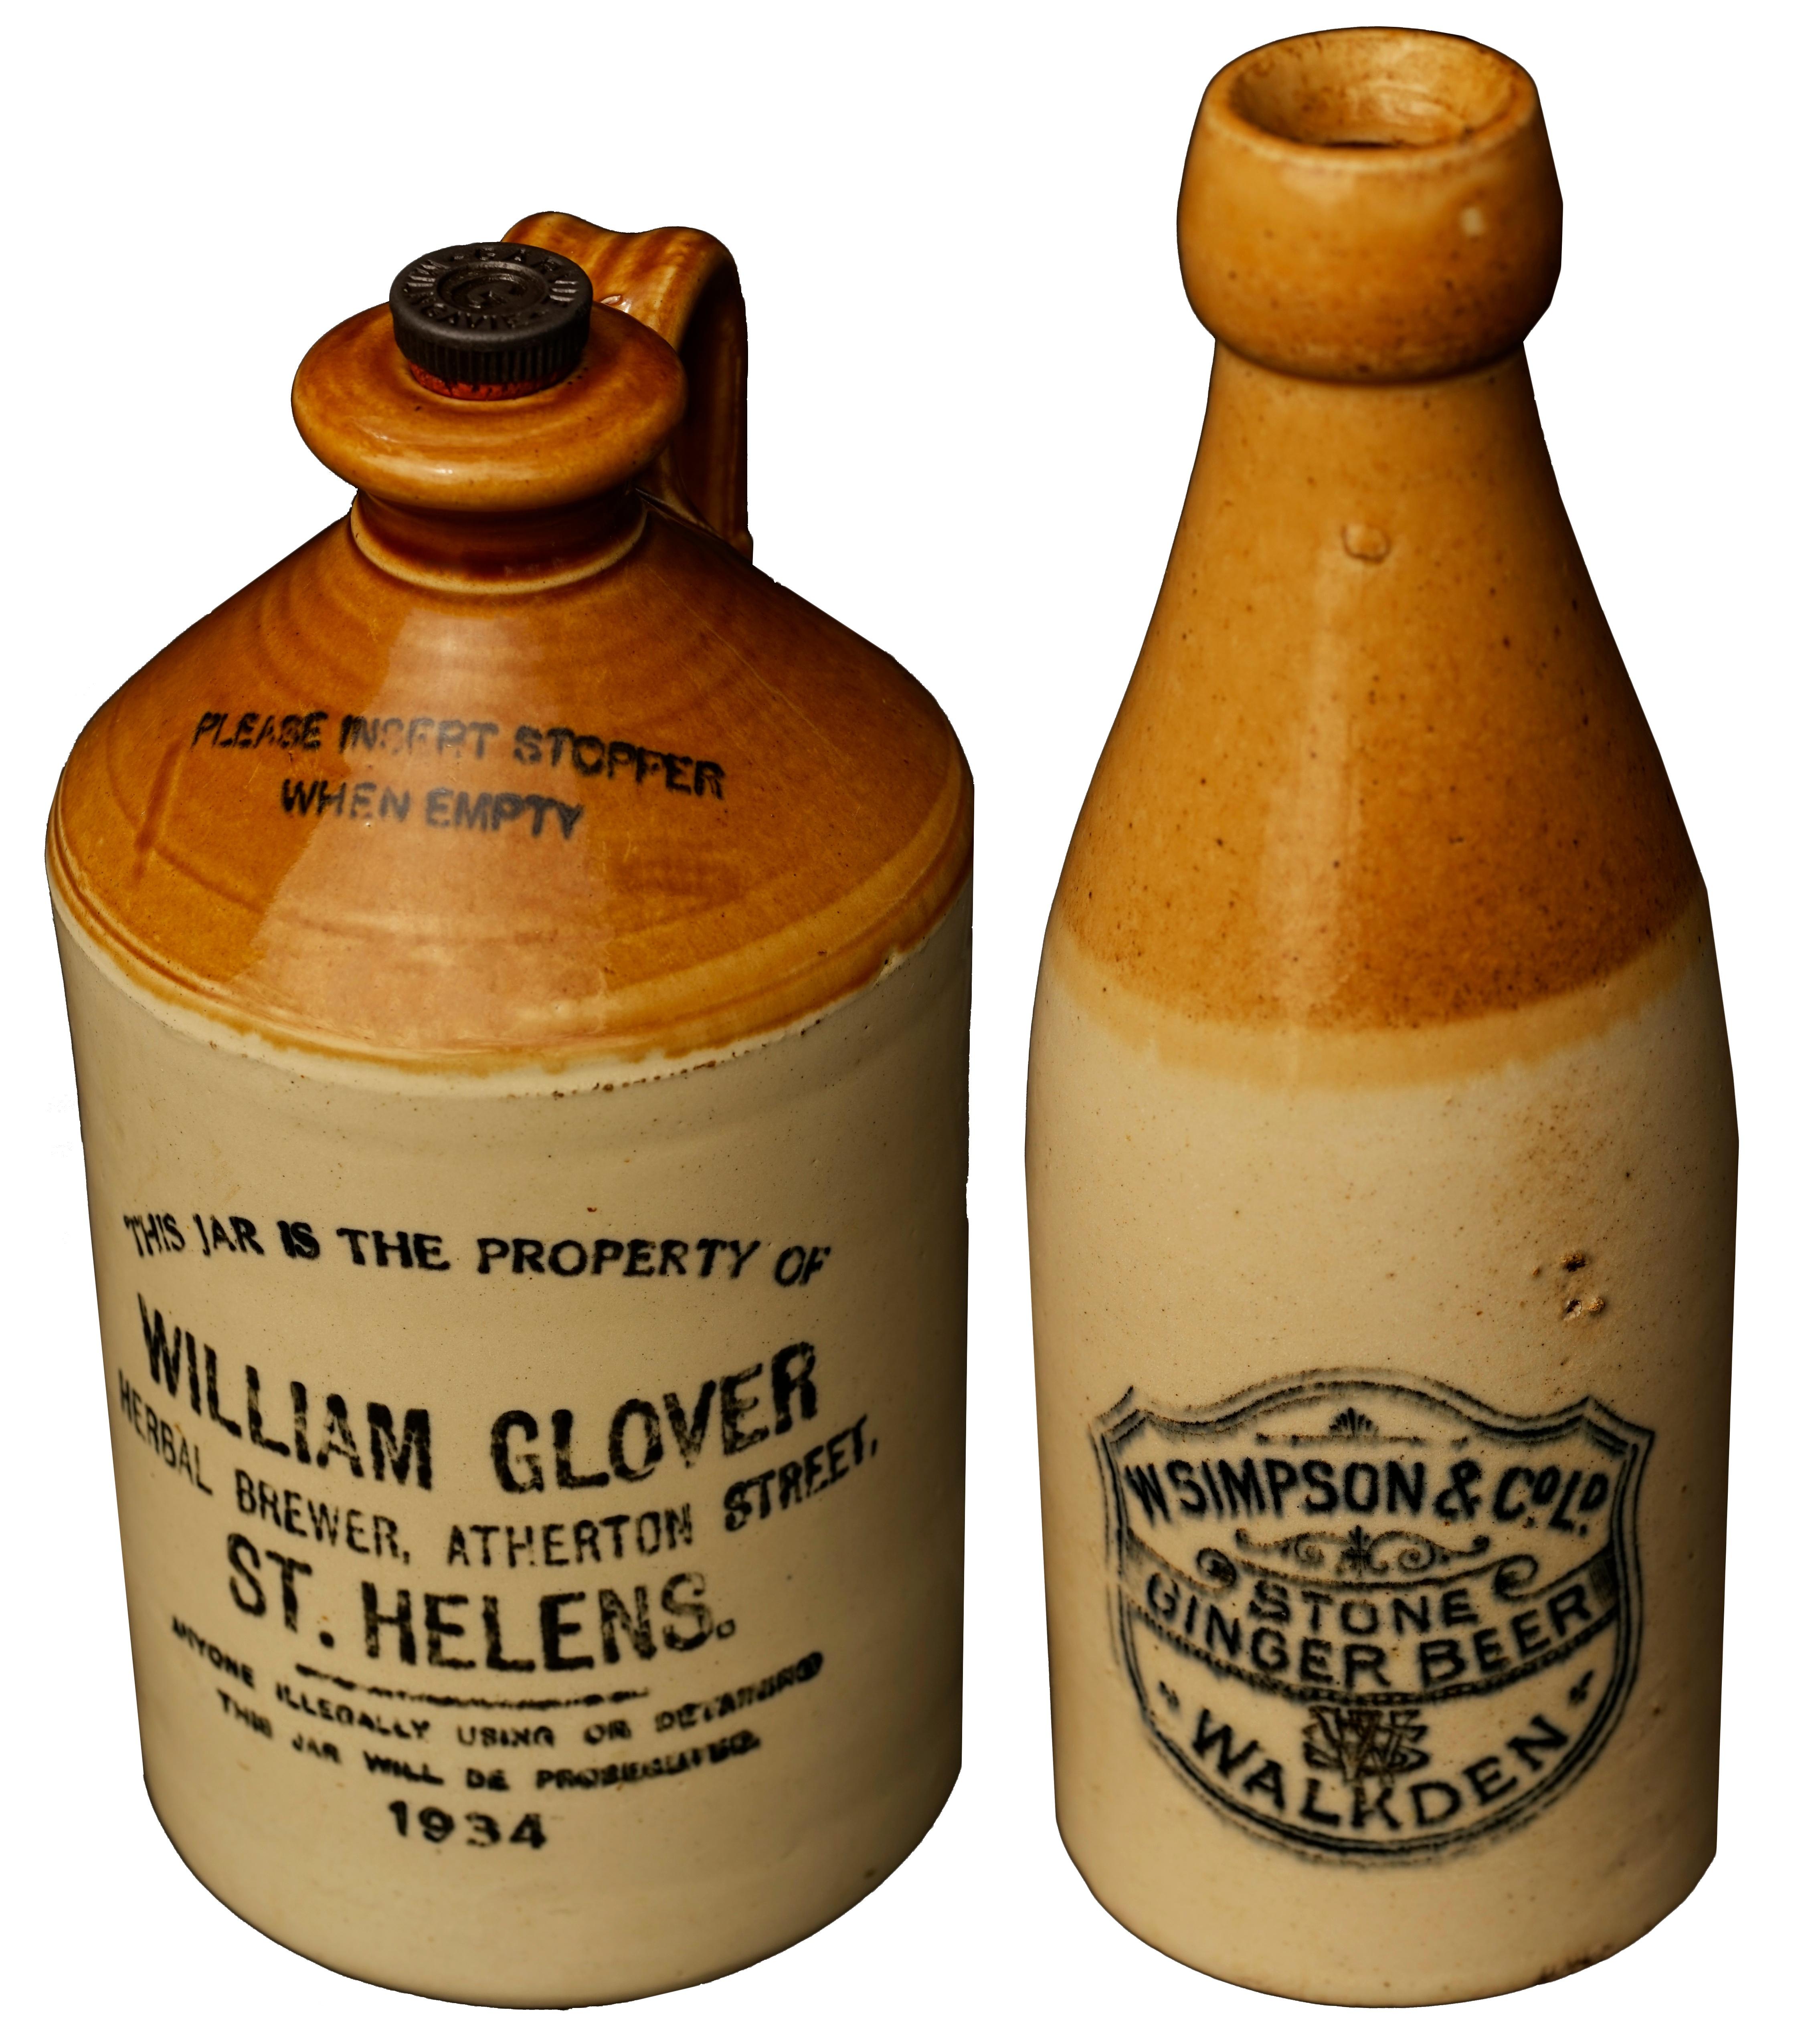 Early 20th century stoneware bottles